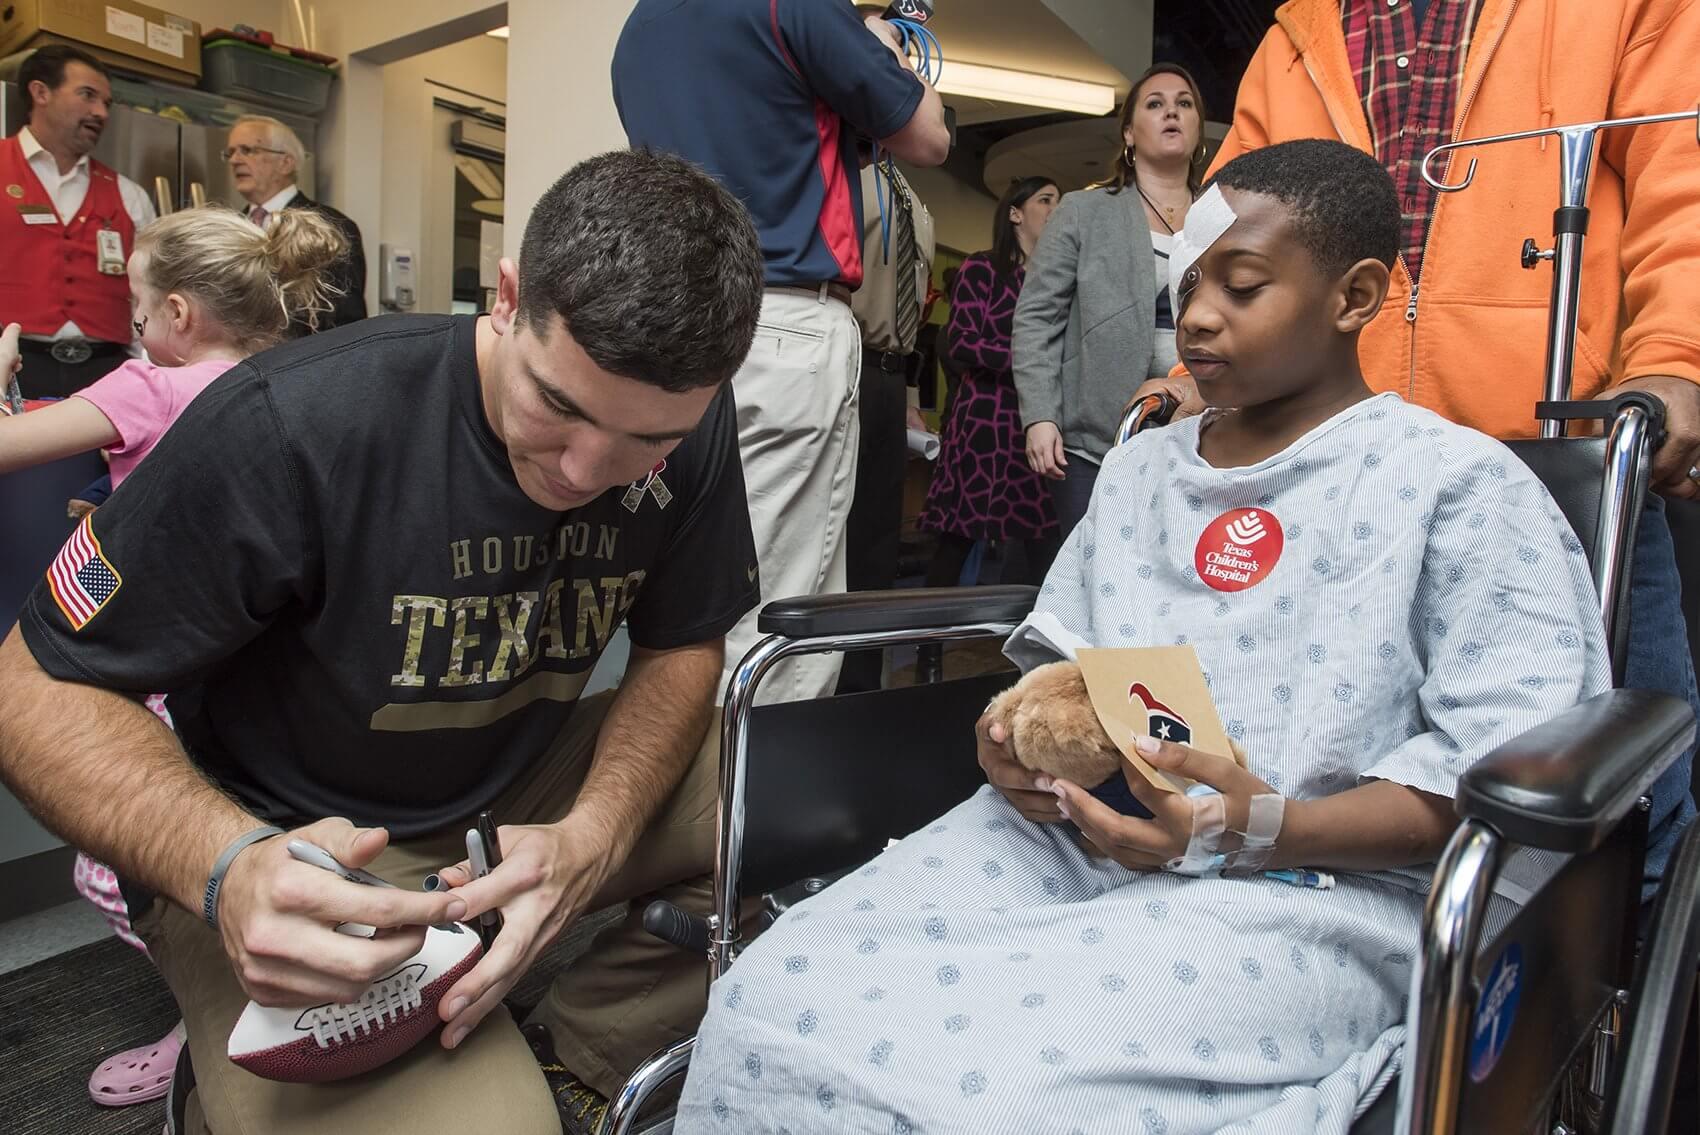 Texans tight end Ryan Griffin autographs a football. (Credit: Allen S. Kramer/Texas Children's Hospital)